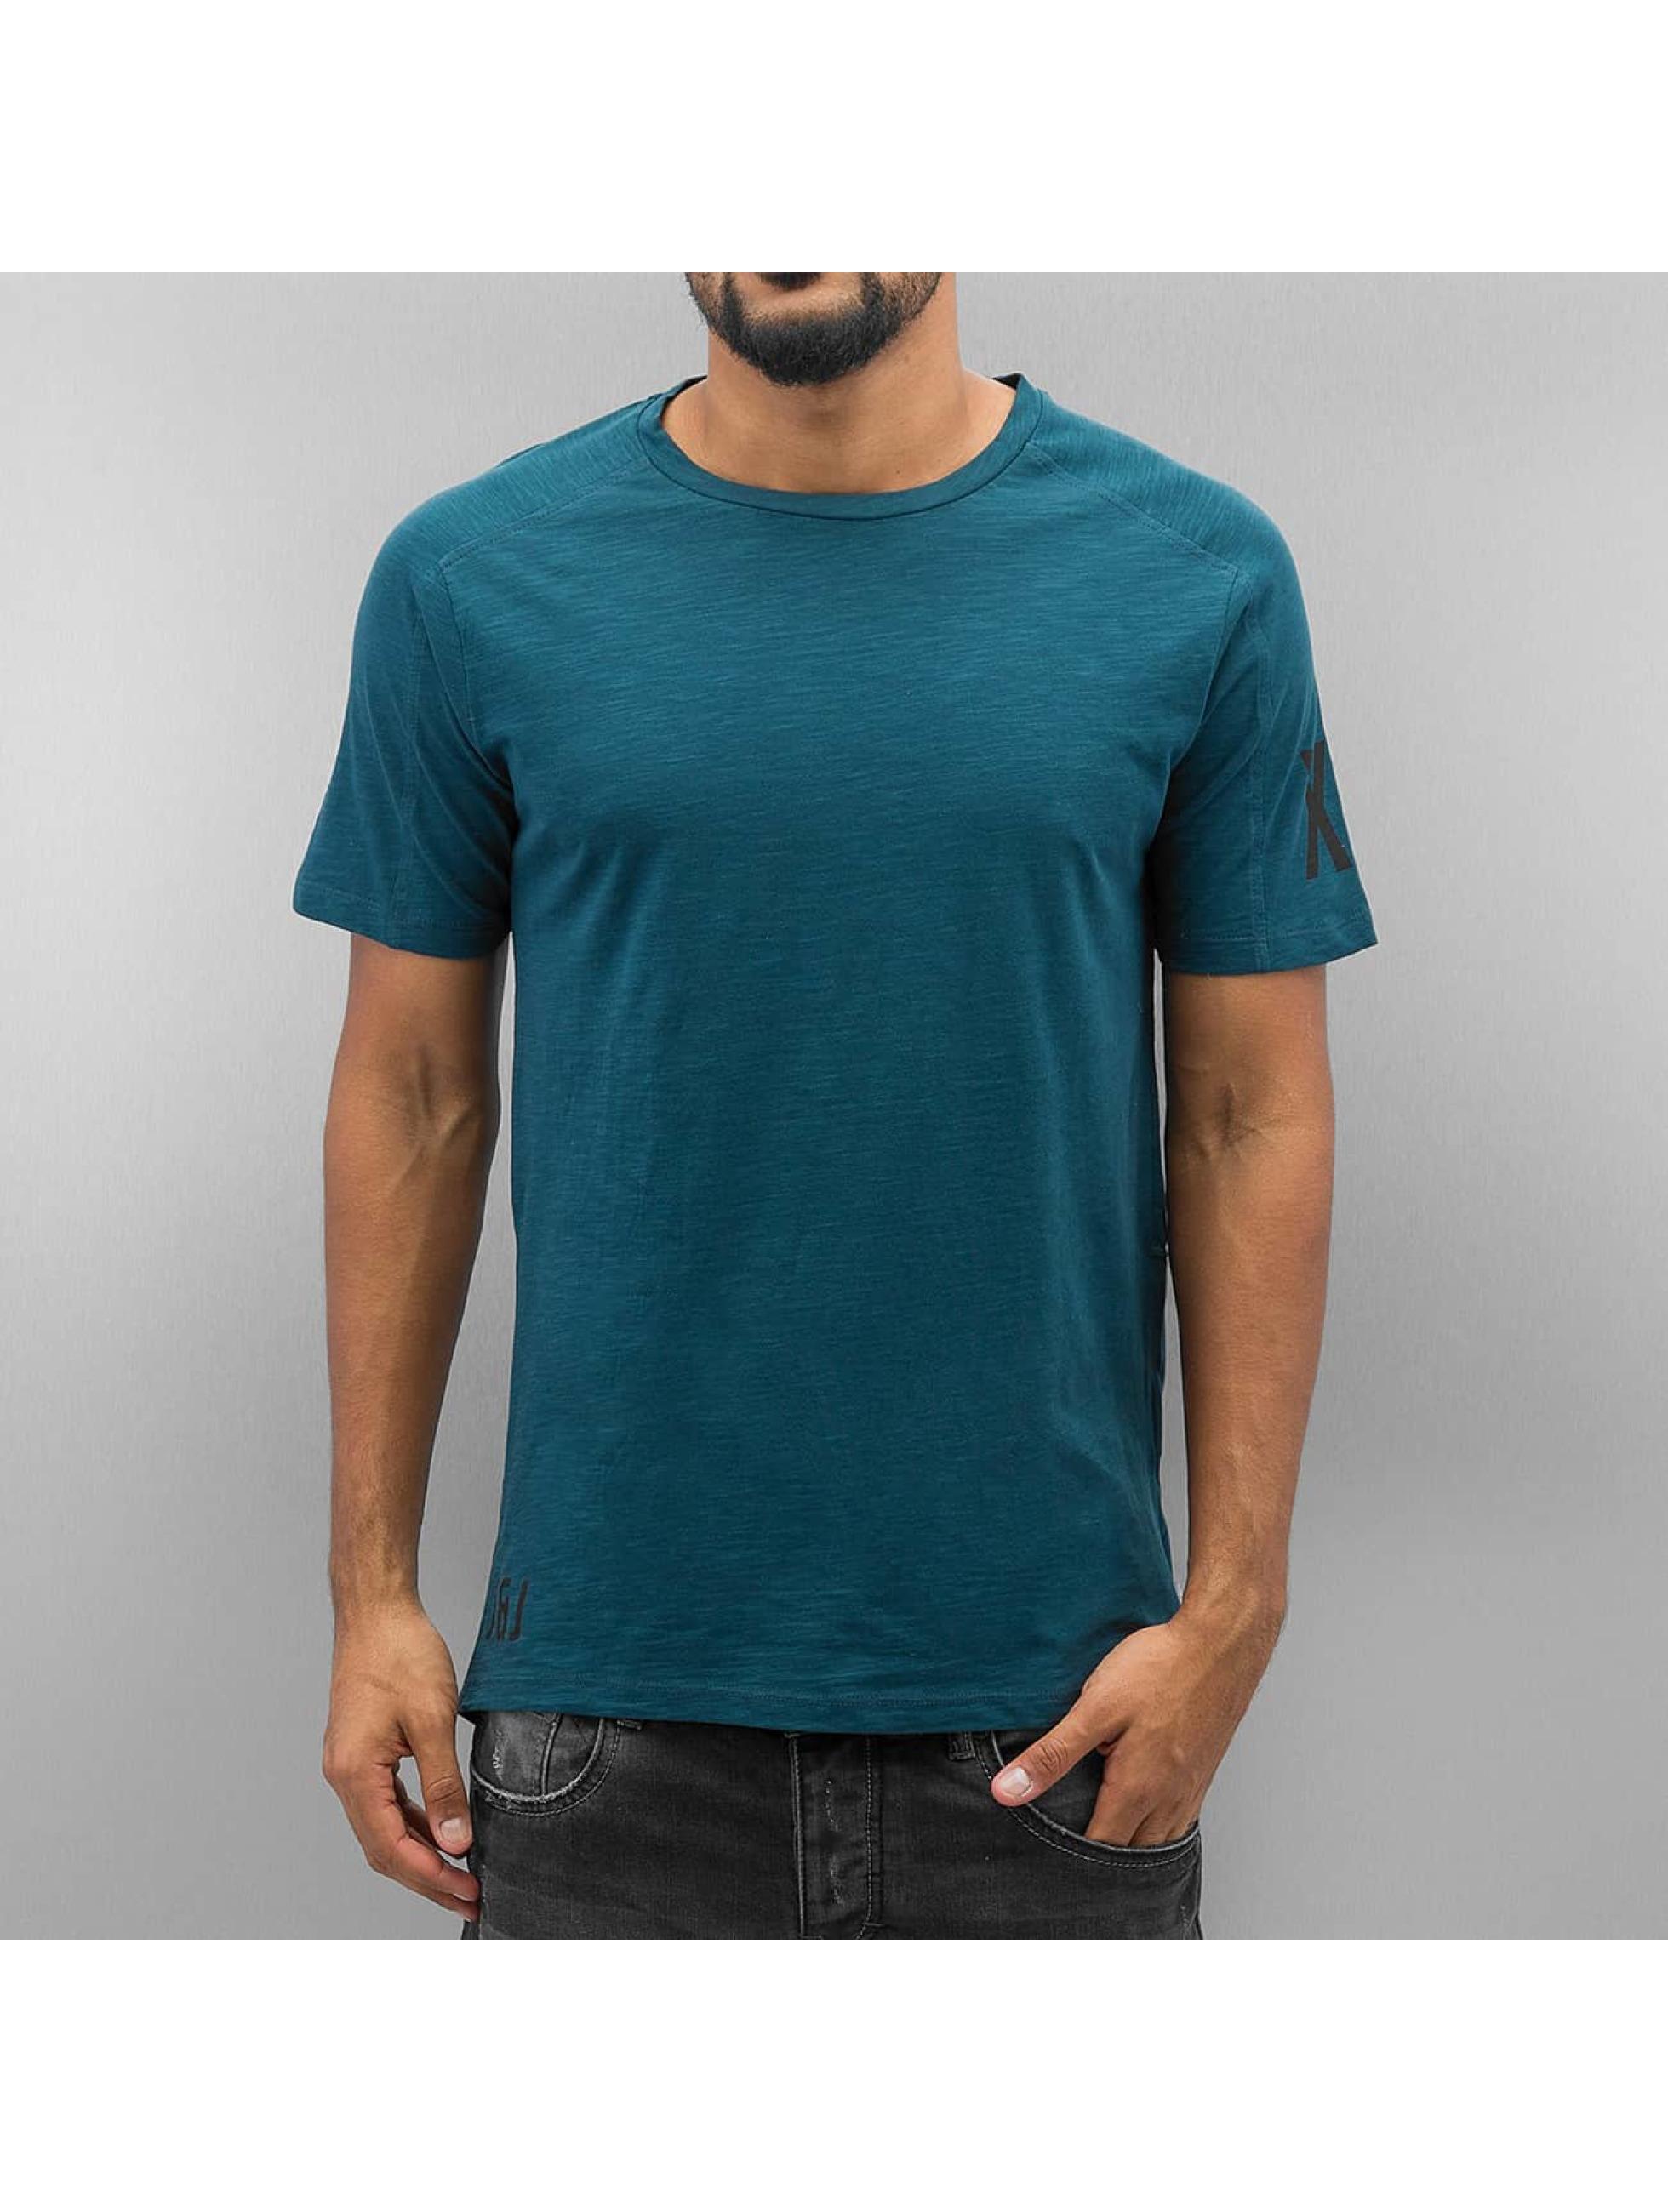 Jack & Jones T-Shirt jjcoZonkey blau